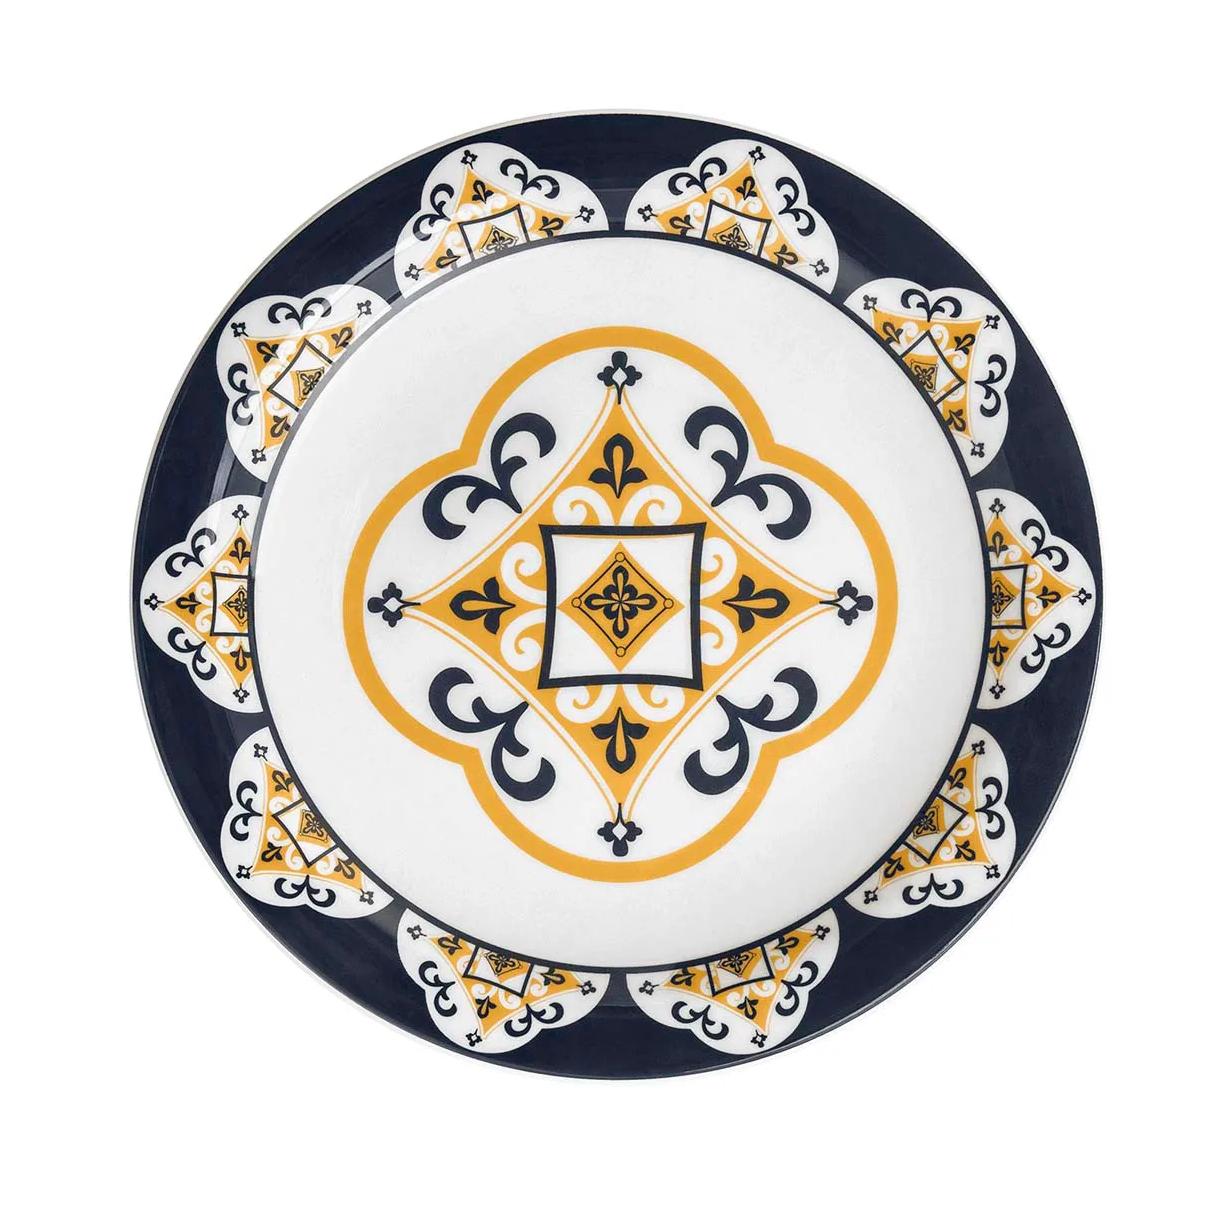 Prato Raso Redondo em Ceramica Sao Luis Branco 26cm - Oxford